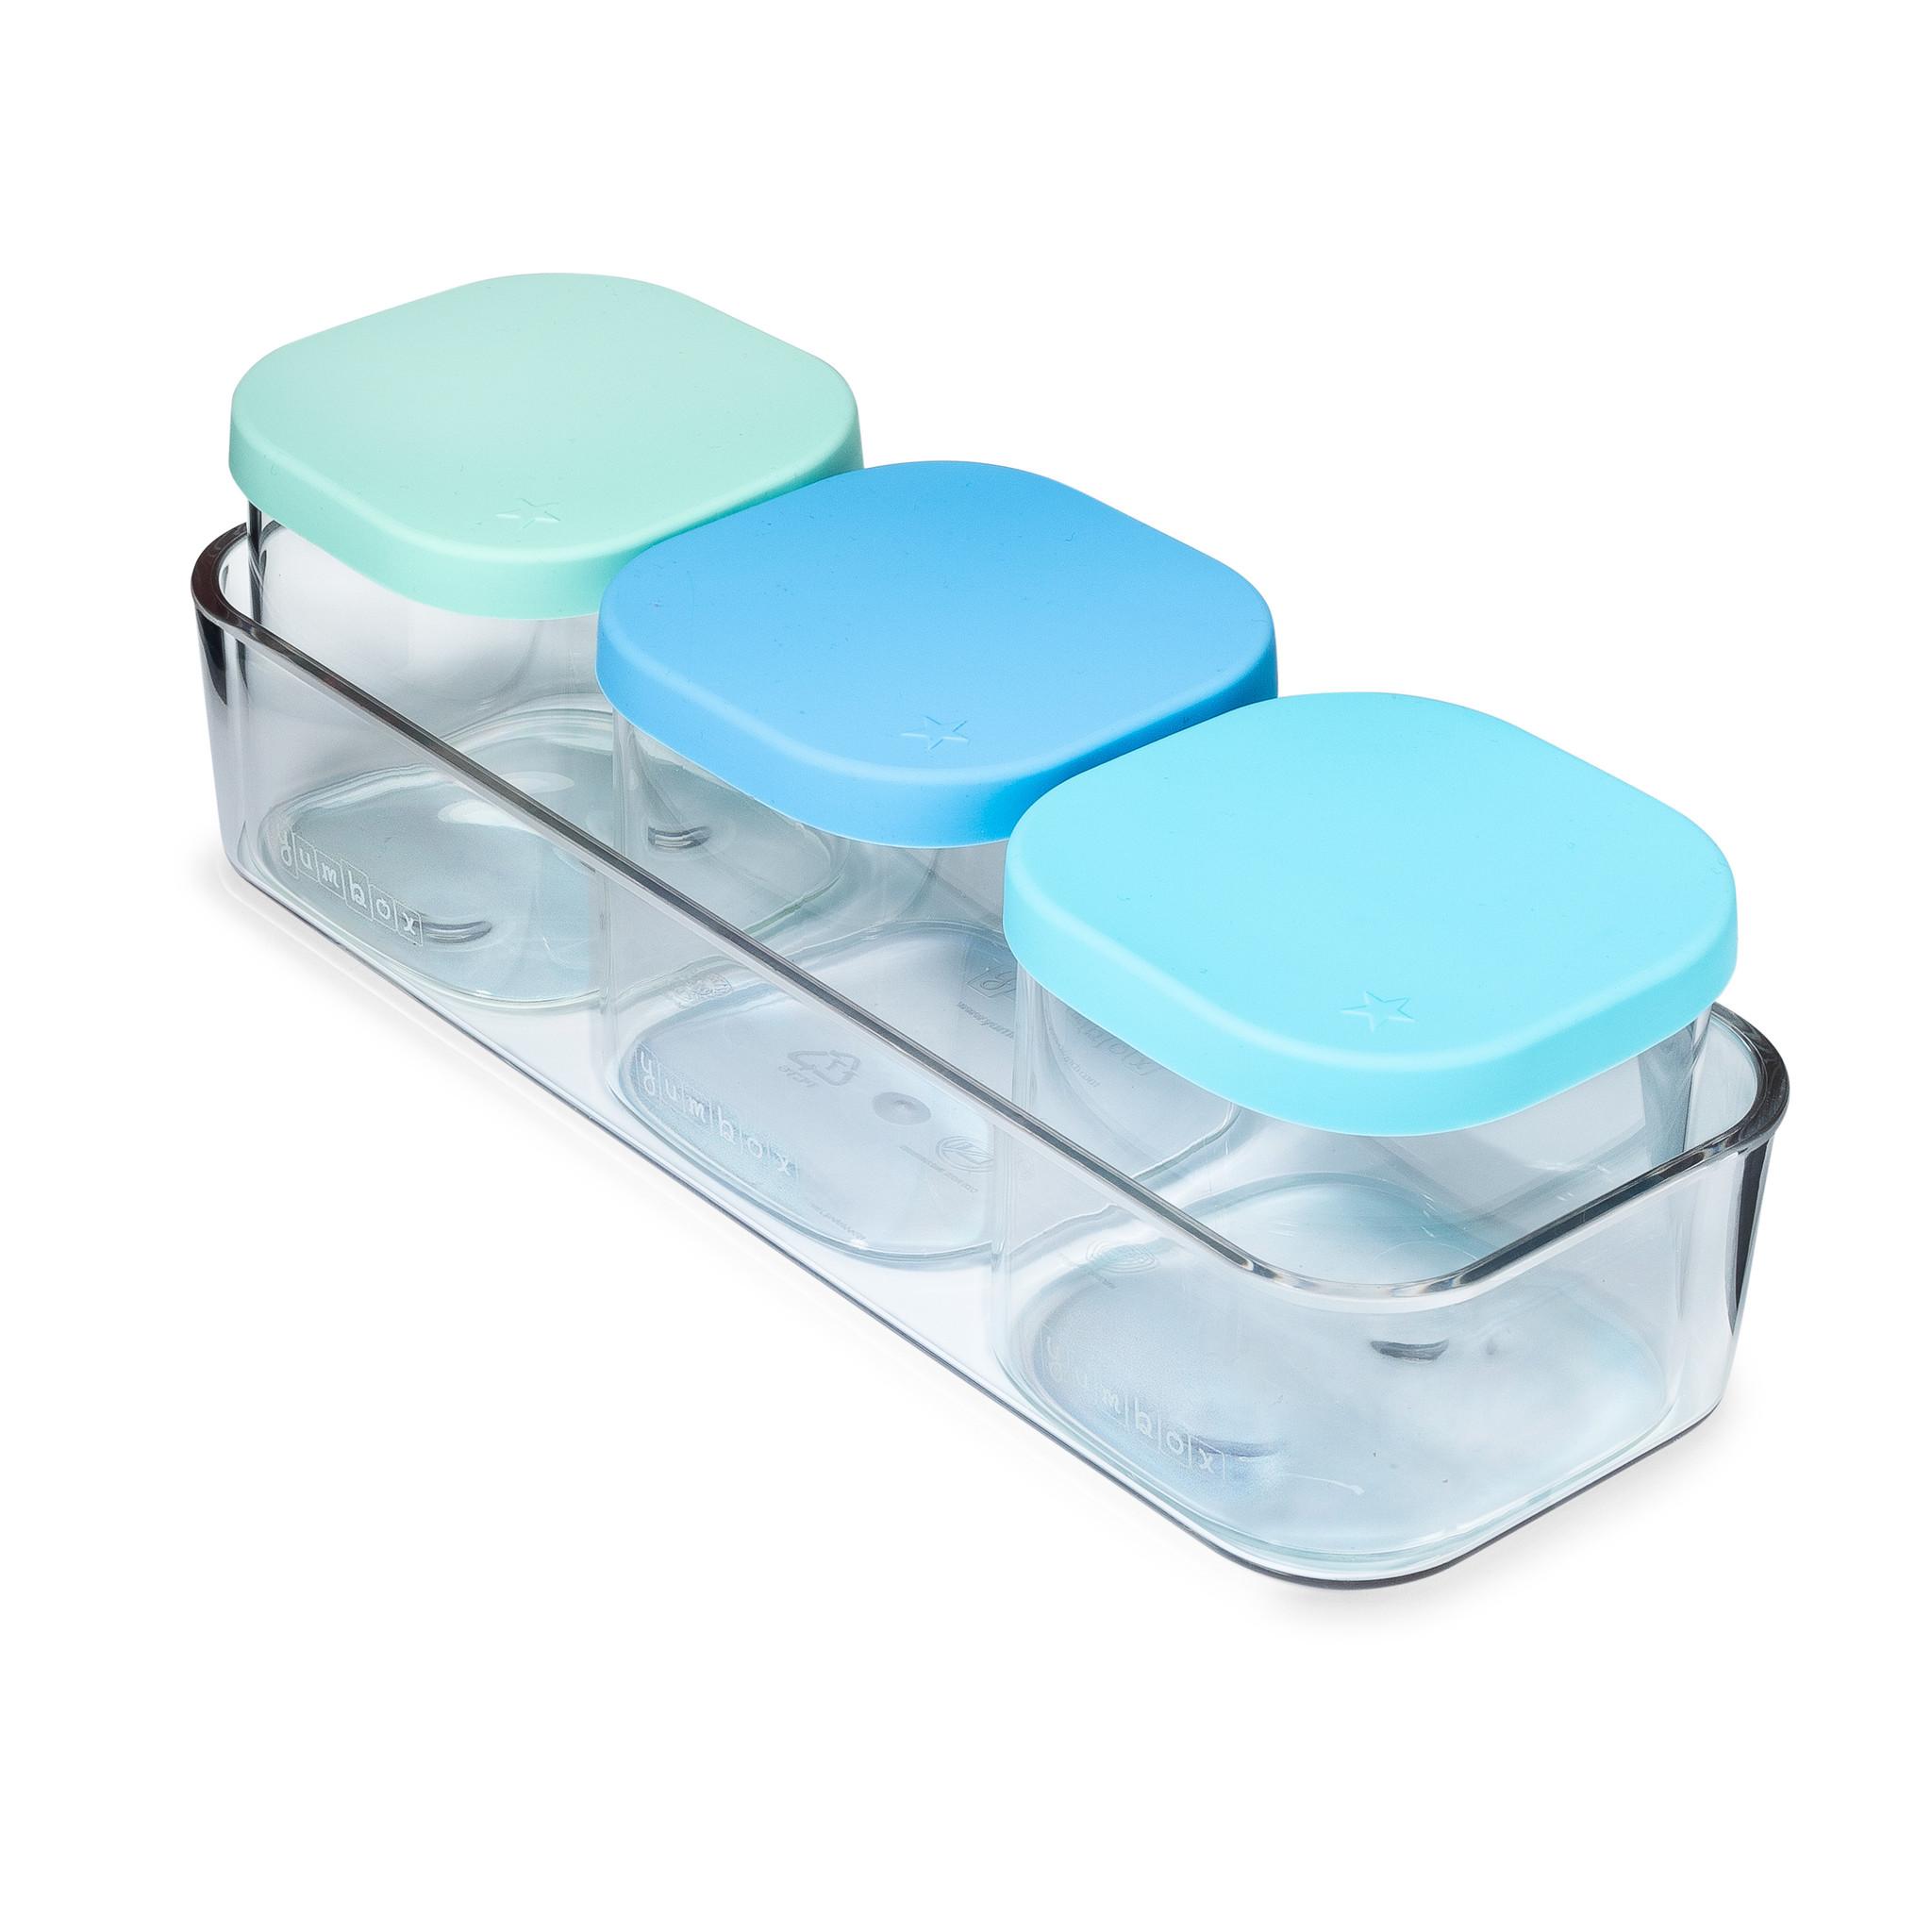 Yumbox Chop Chop tray, rectangular-10